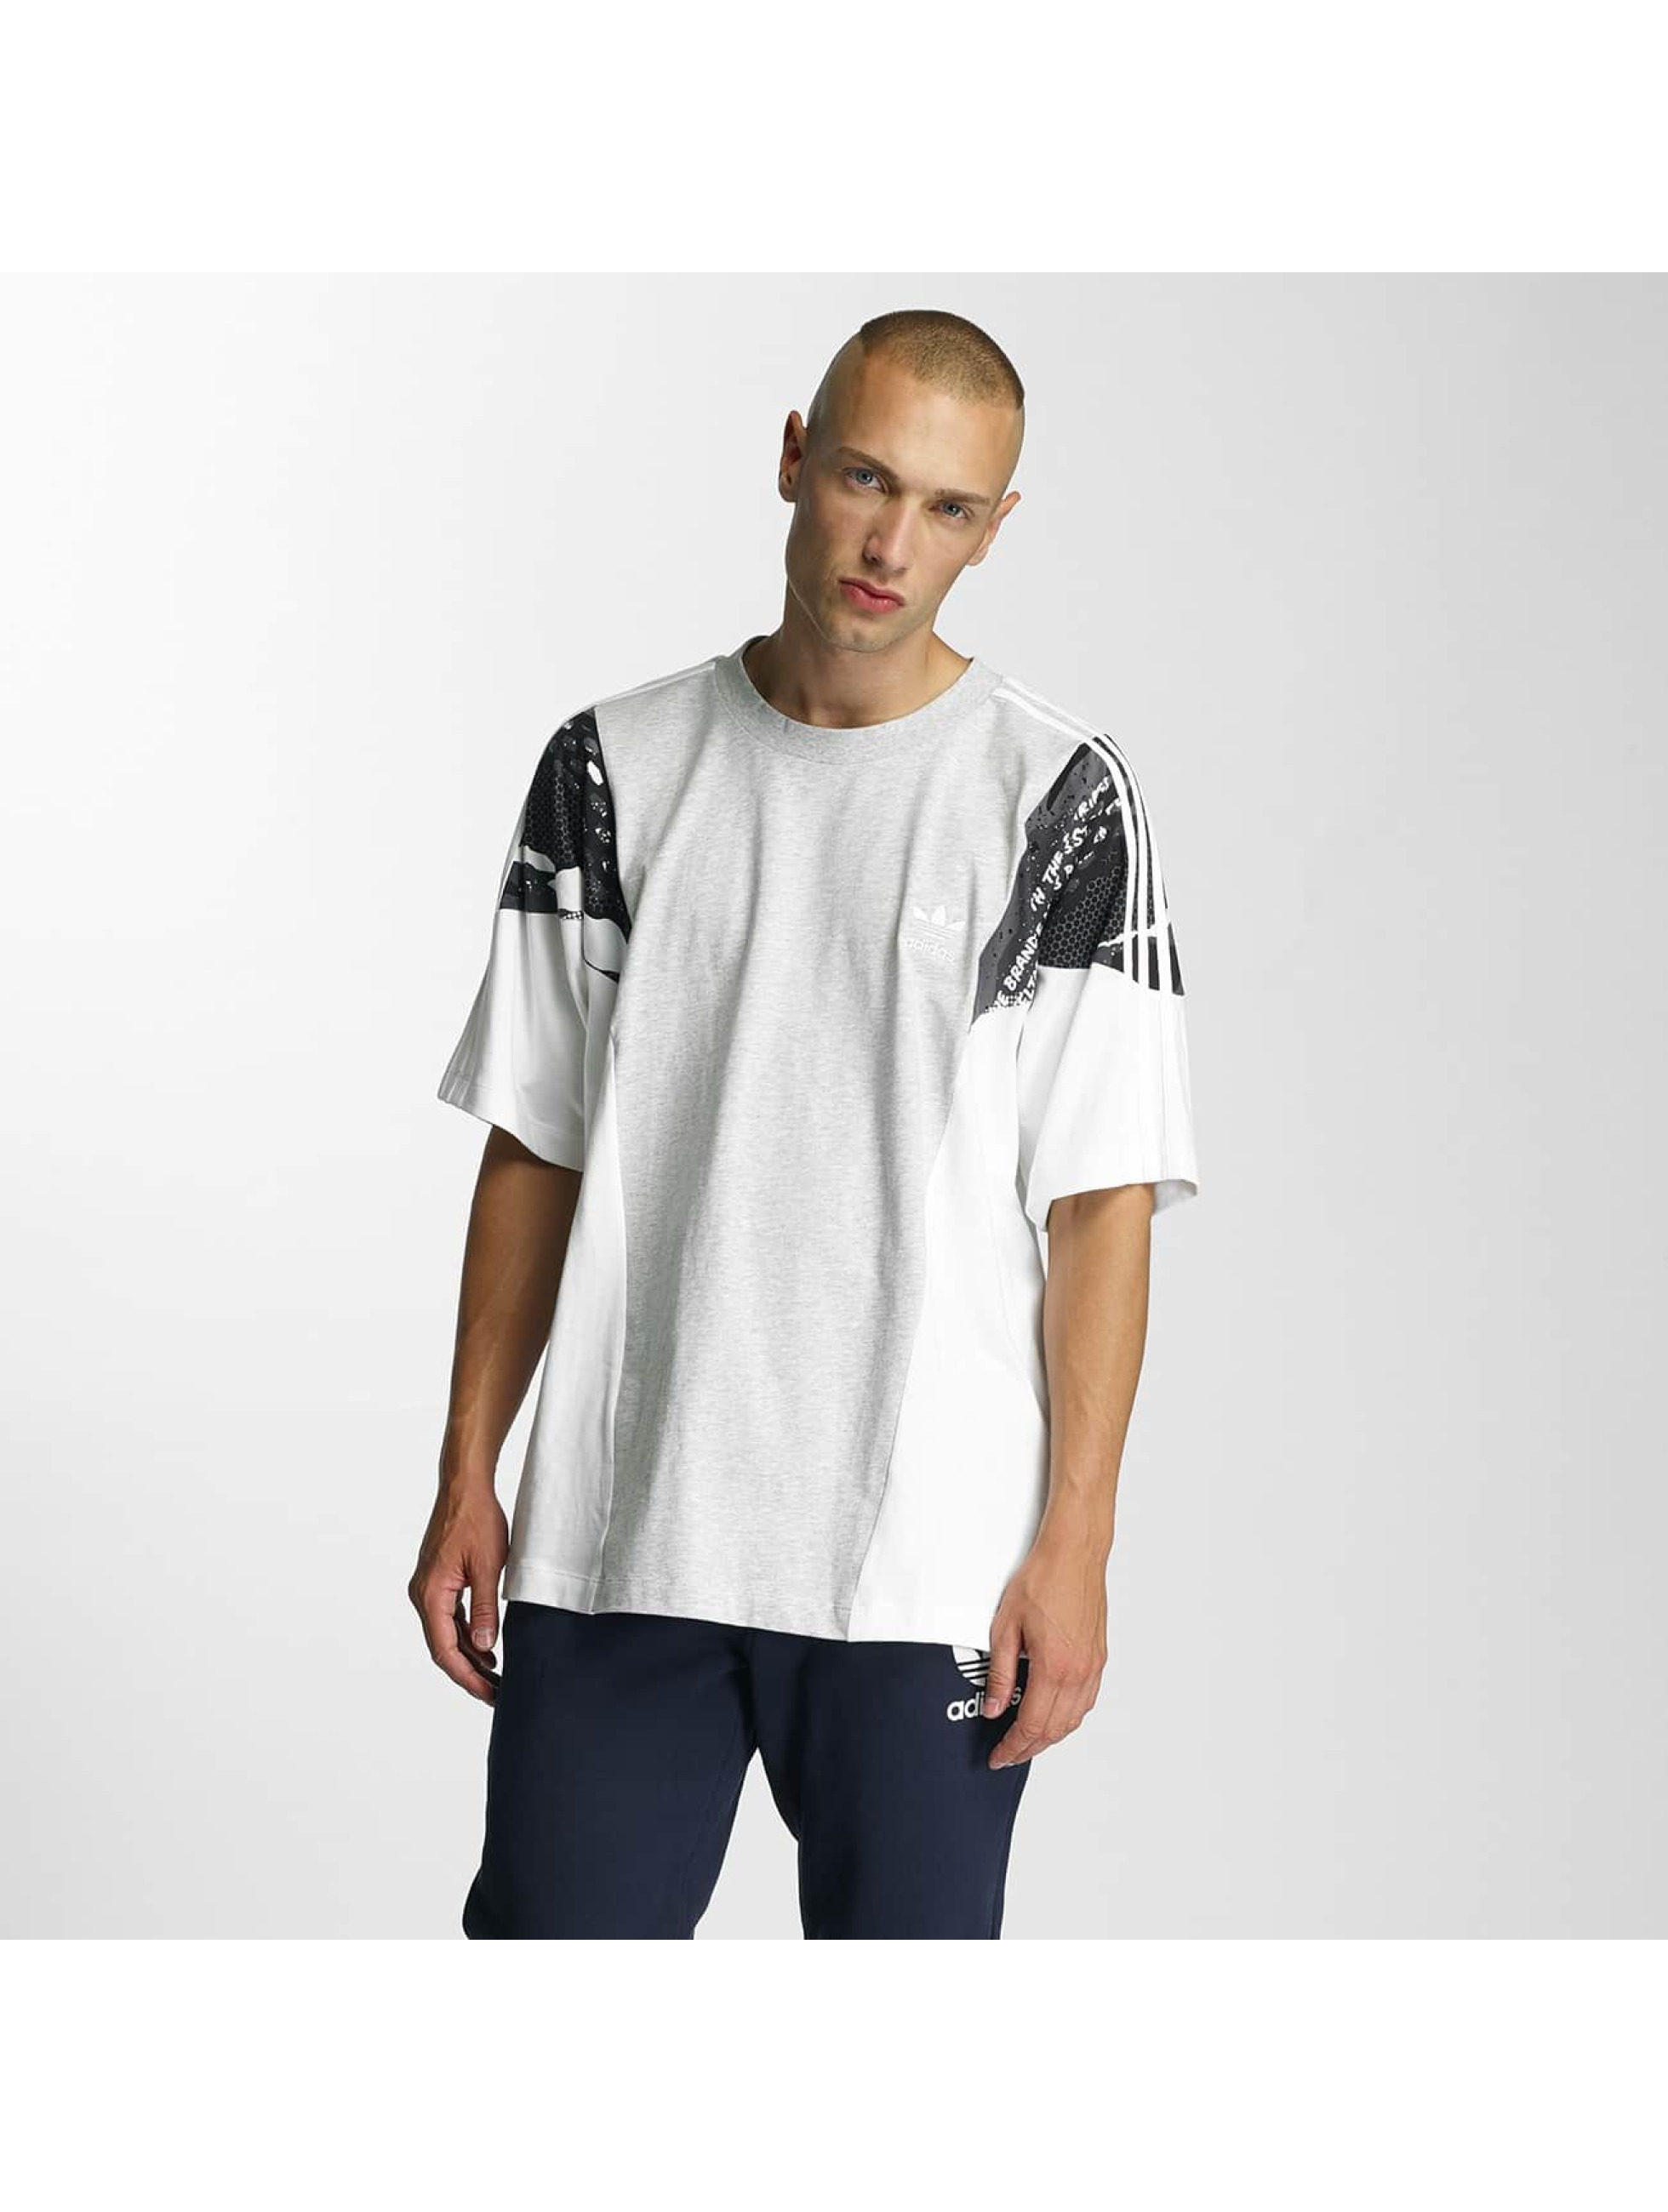 adidas Männer T-Shirt LA Boxy in weiß